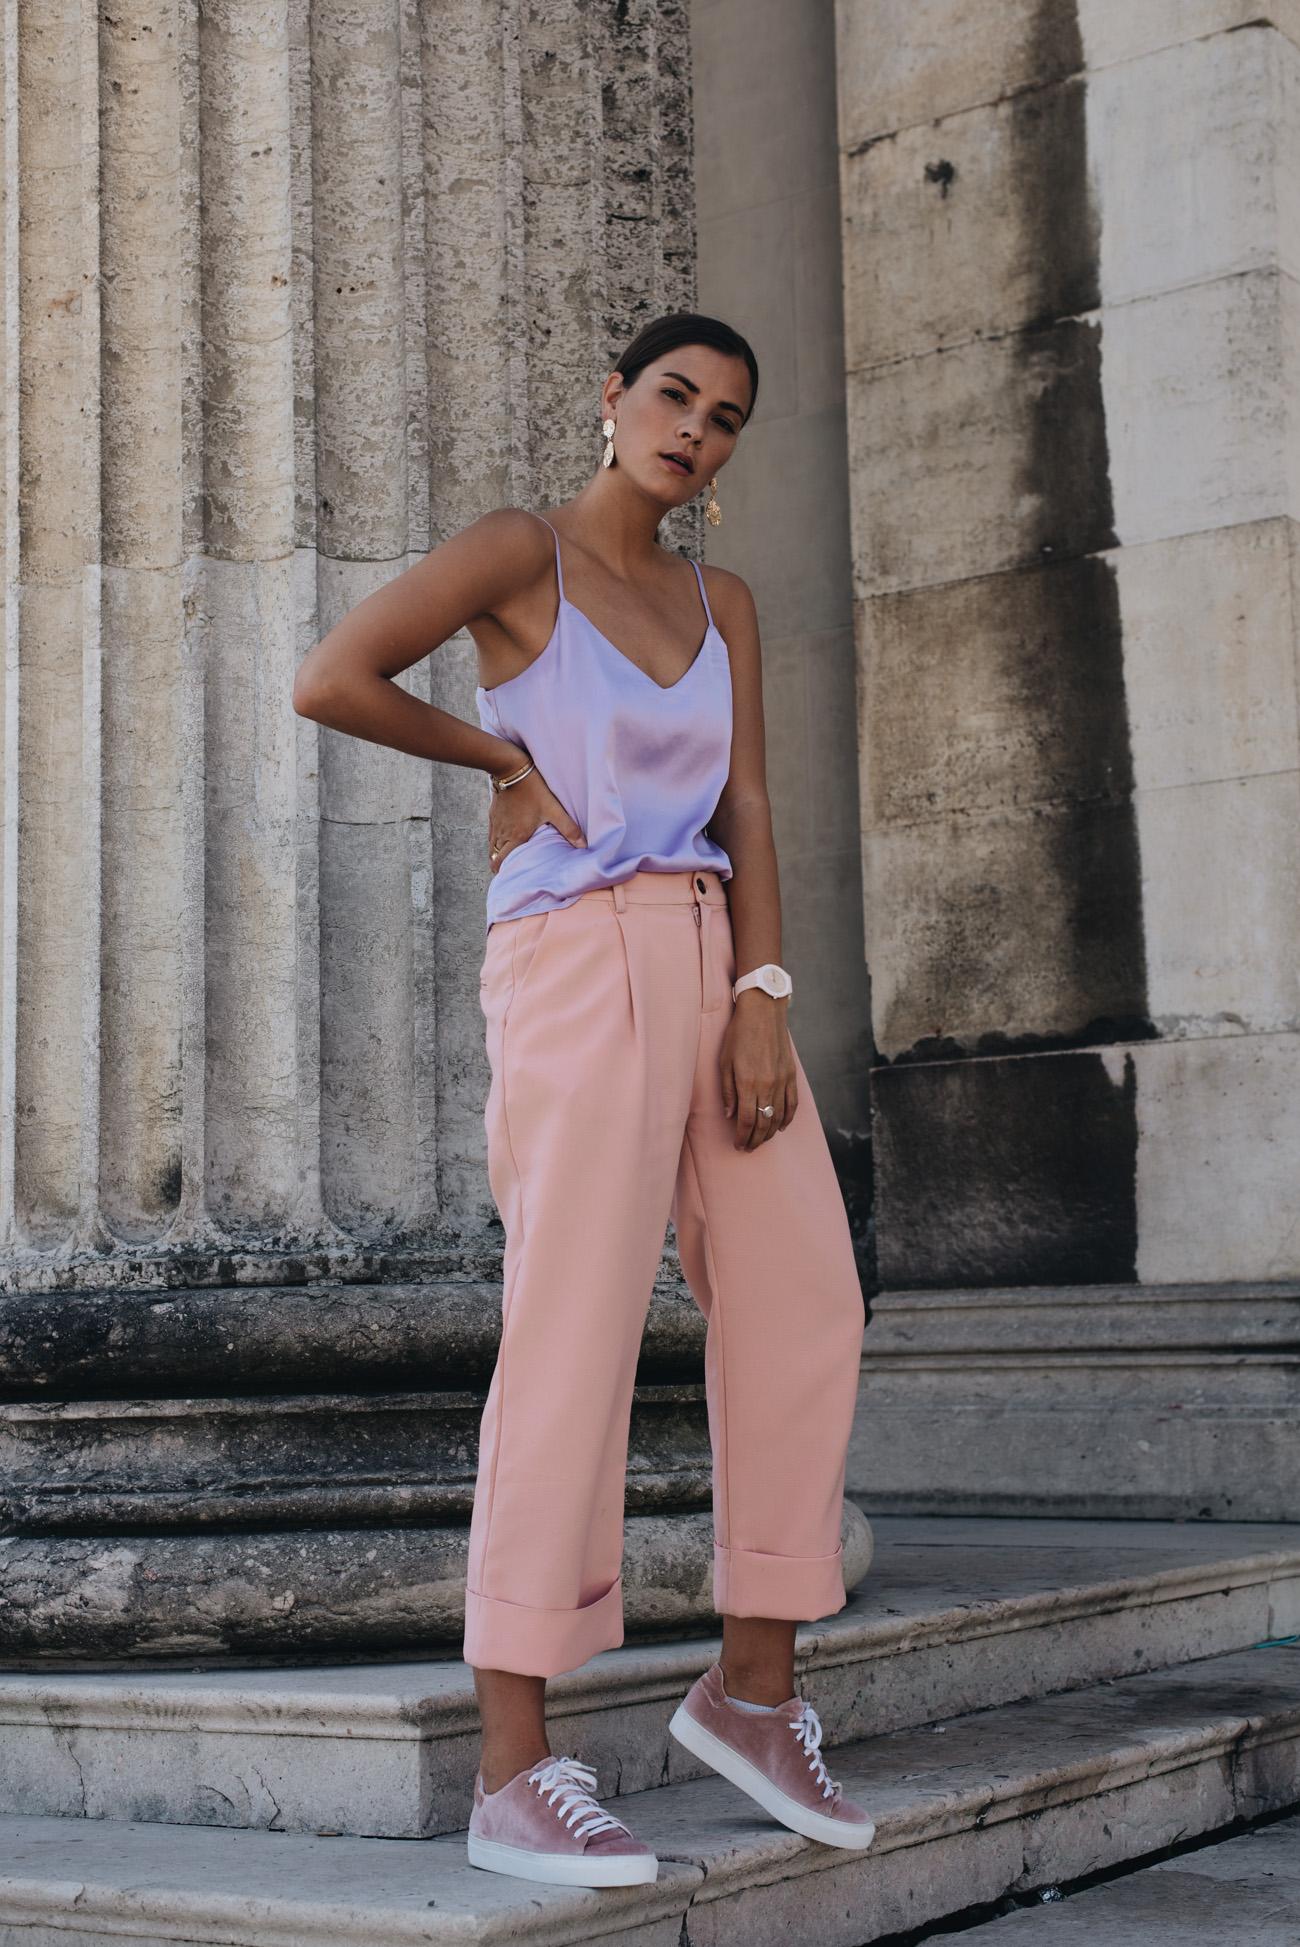 rosa-culotte-hose-damen-kombinieren-samt-sneaker-amber-be-fashiioncarpet-nina-schwichtenberg